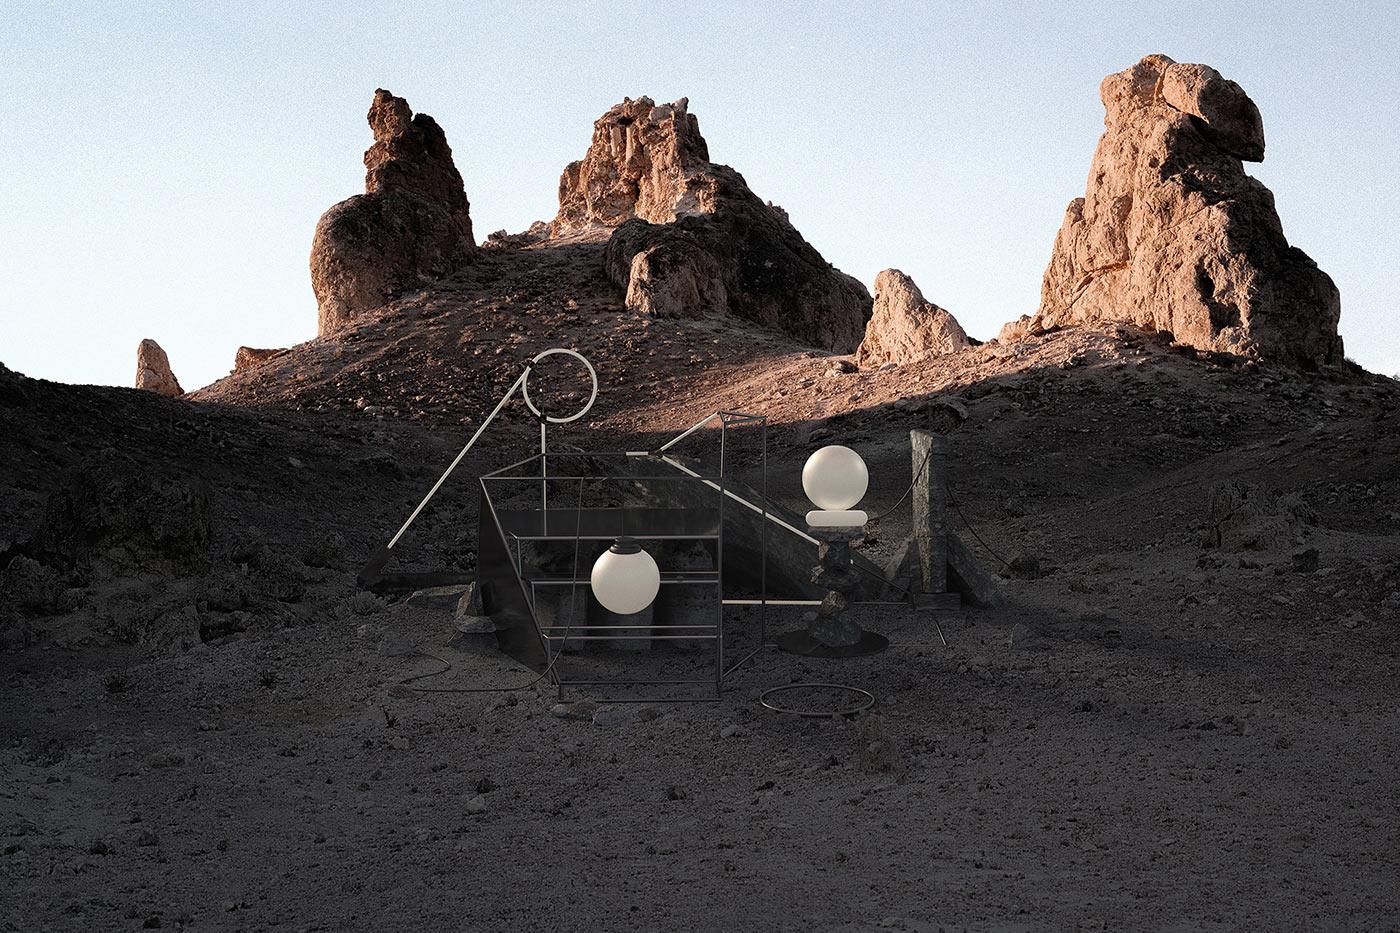 Co-Existe, monumentos digitales en plena naturaleza